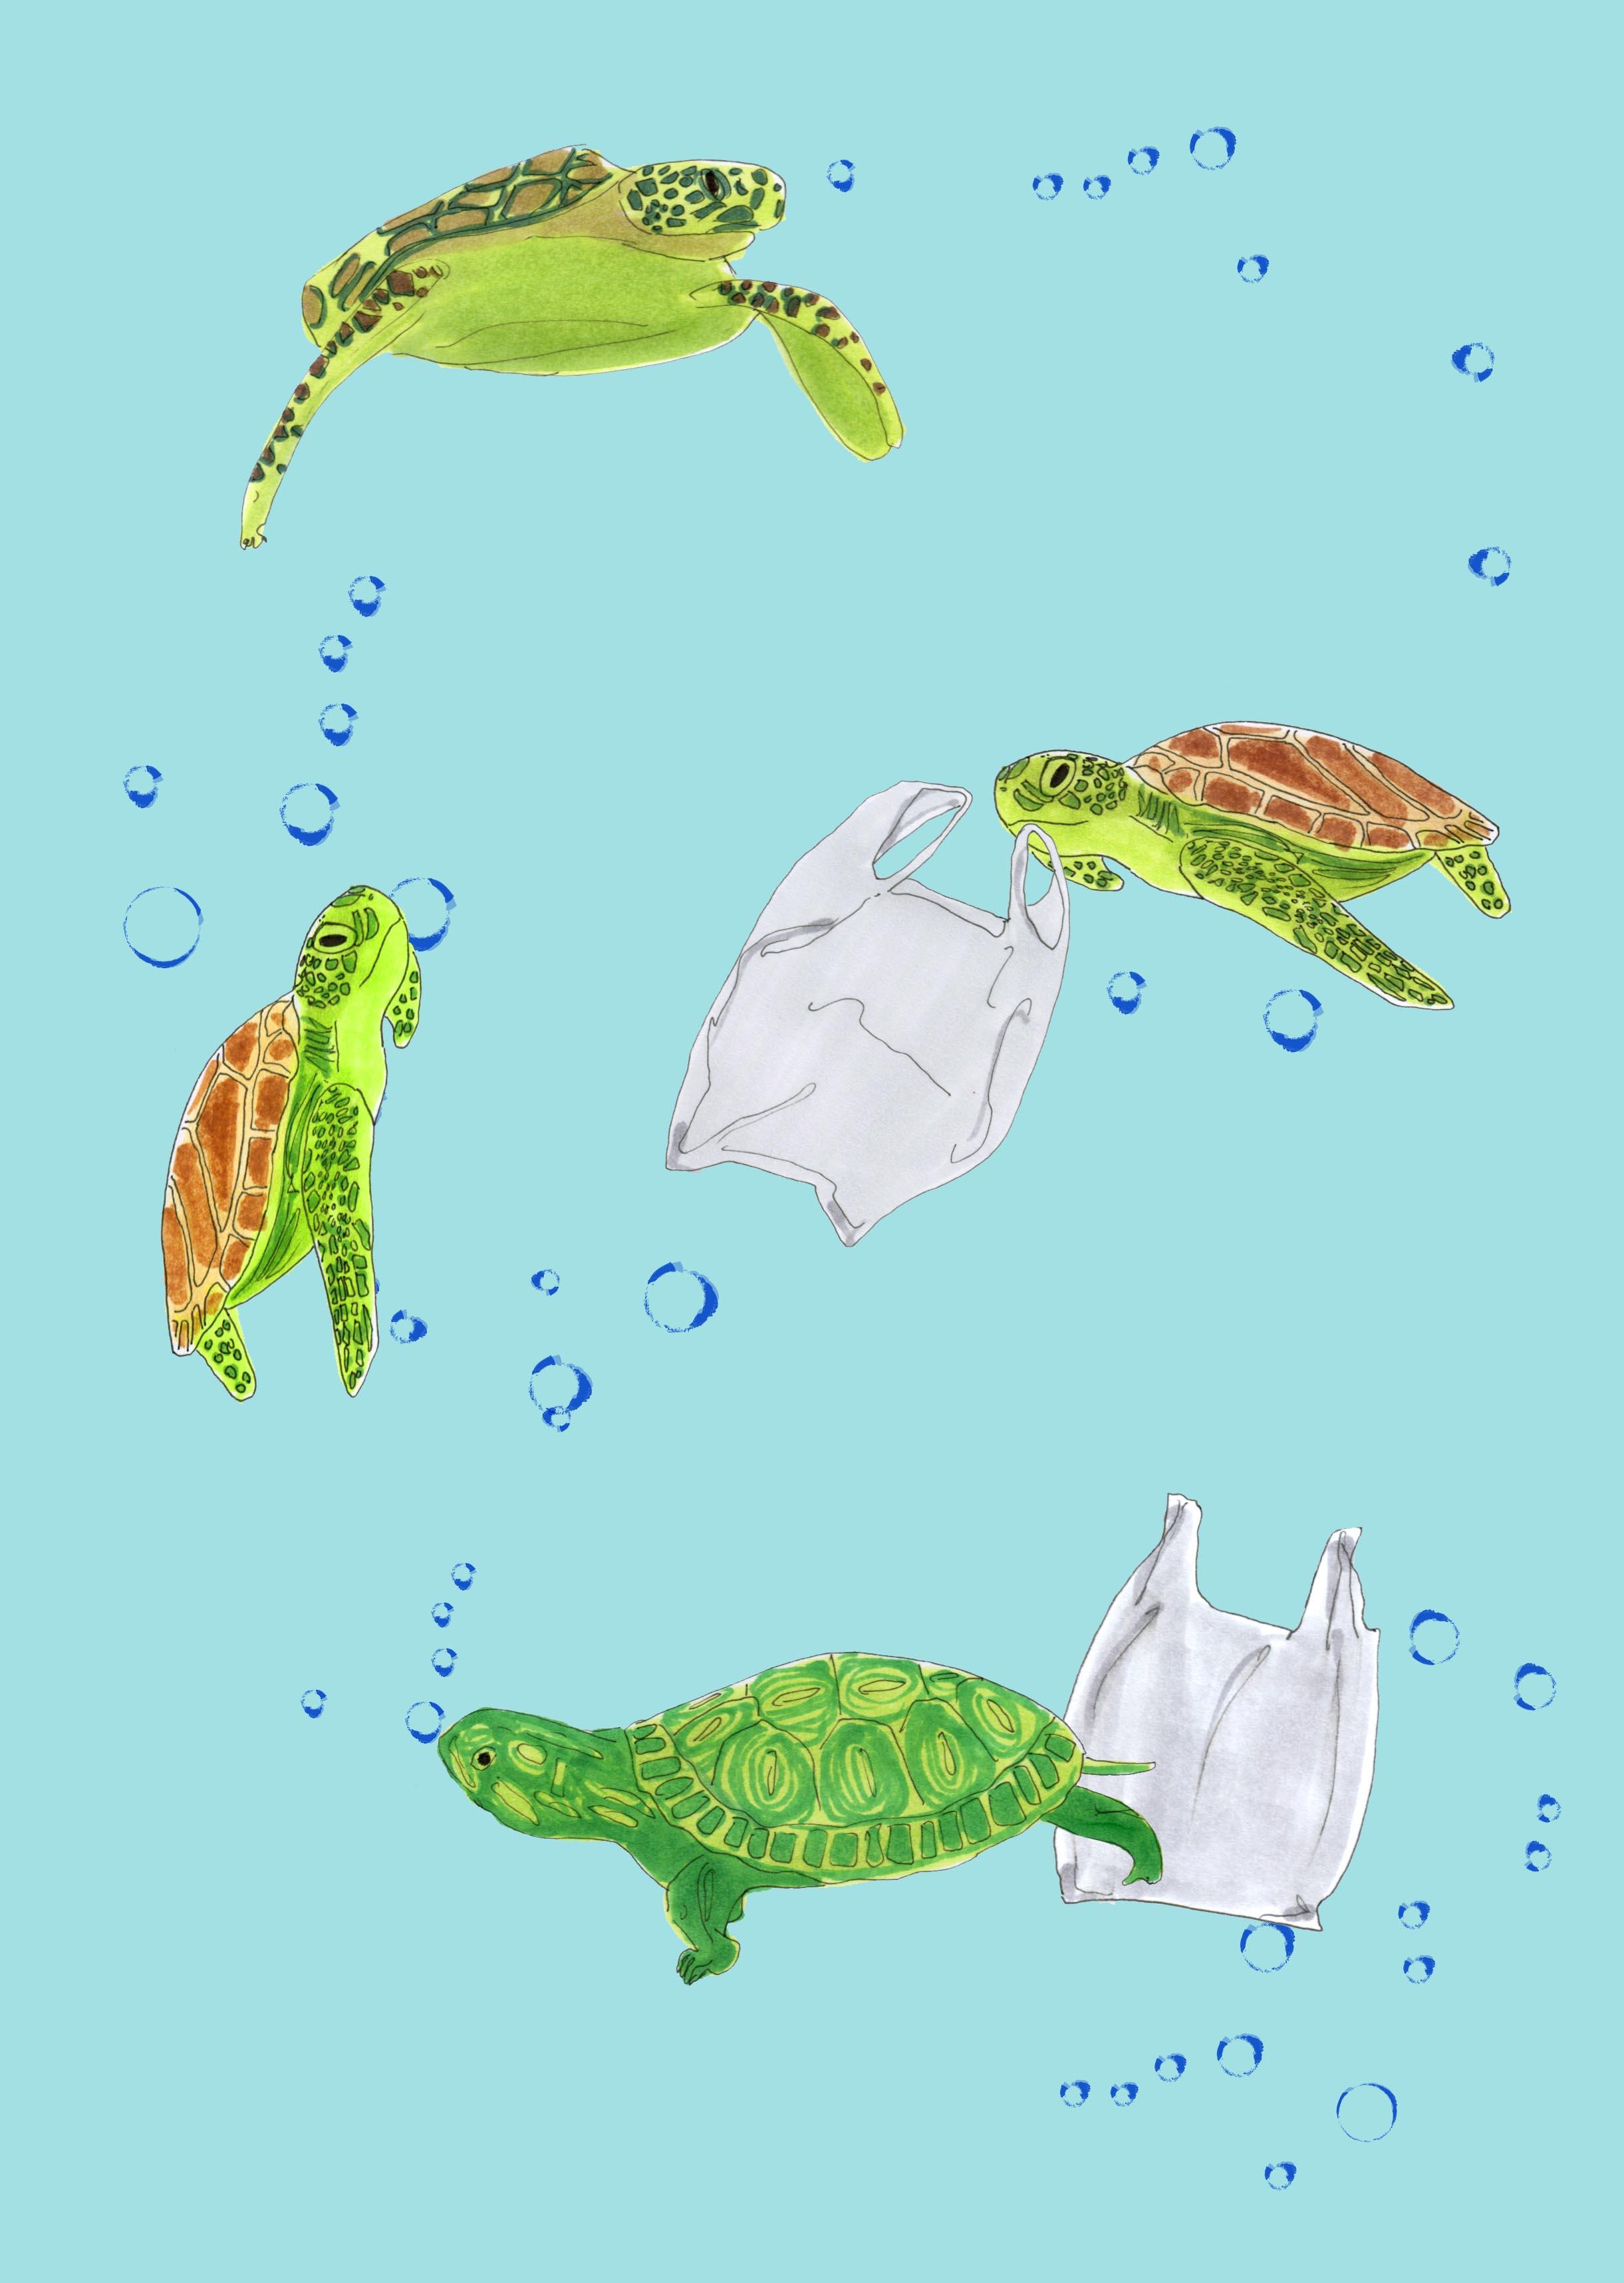 Illustration by Juliet Sulejmani for Wardrobe Crisis.